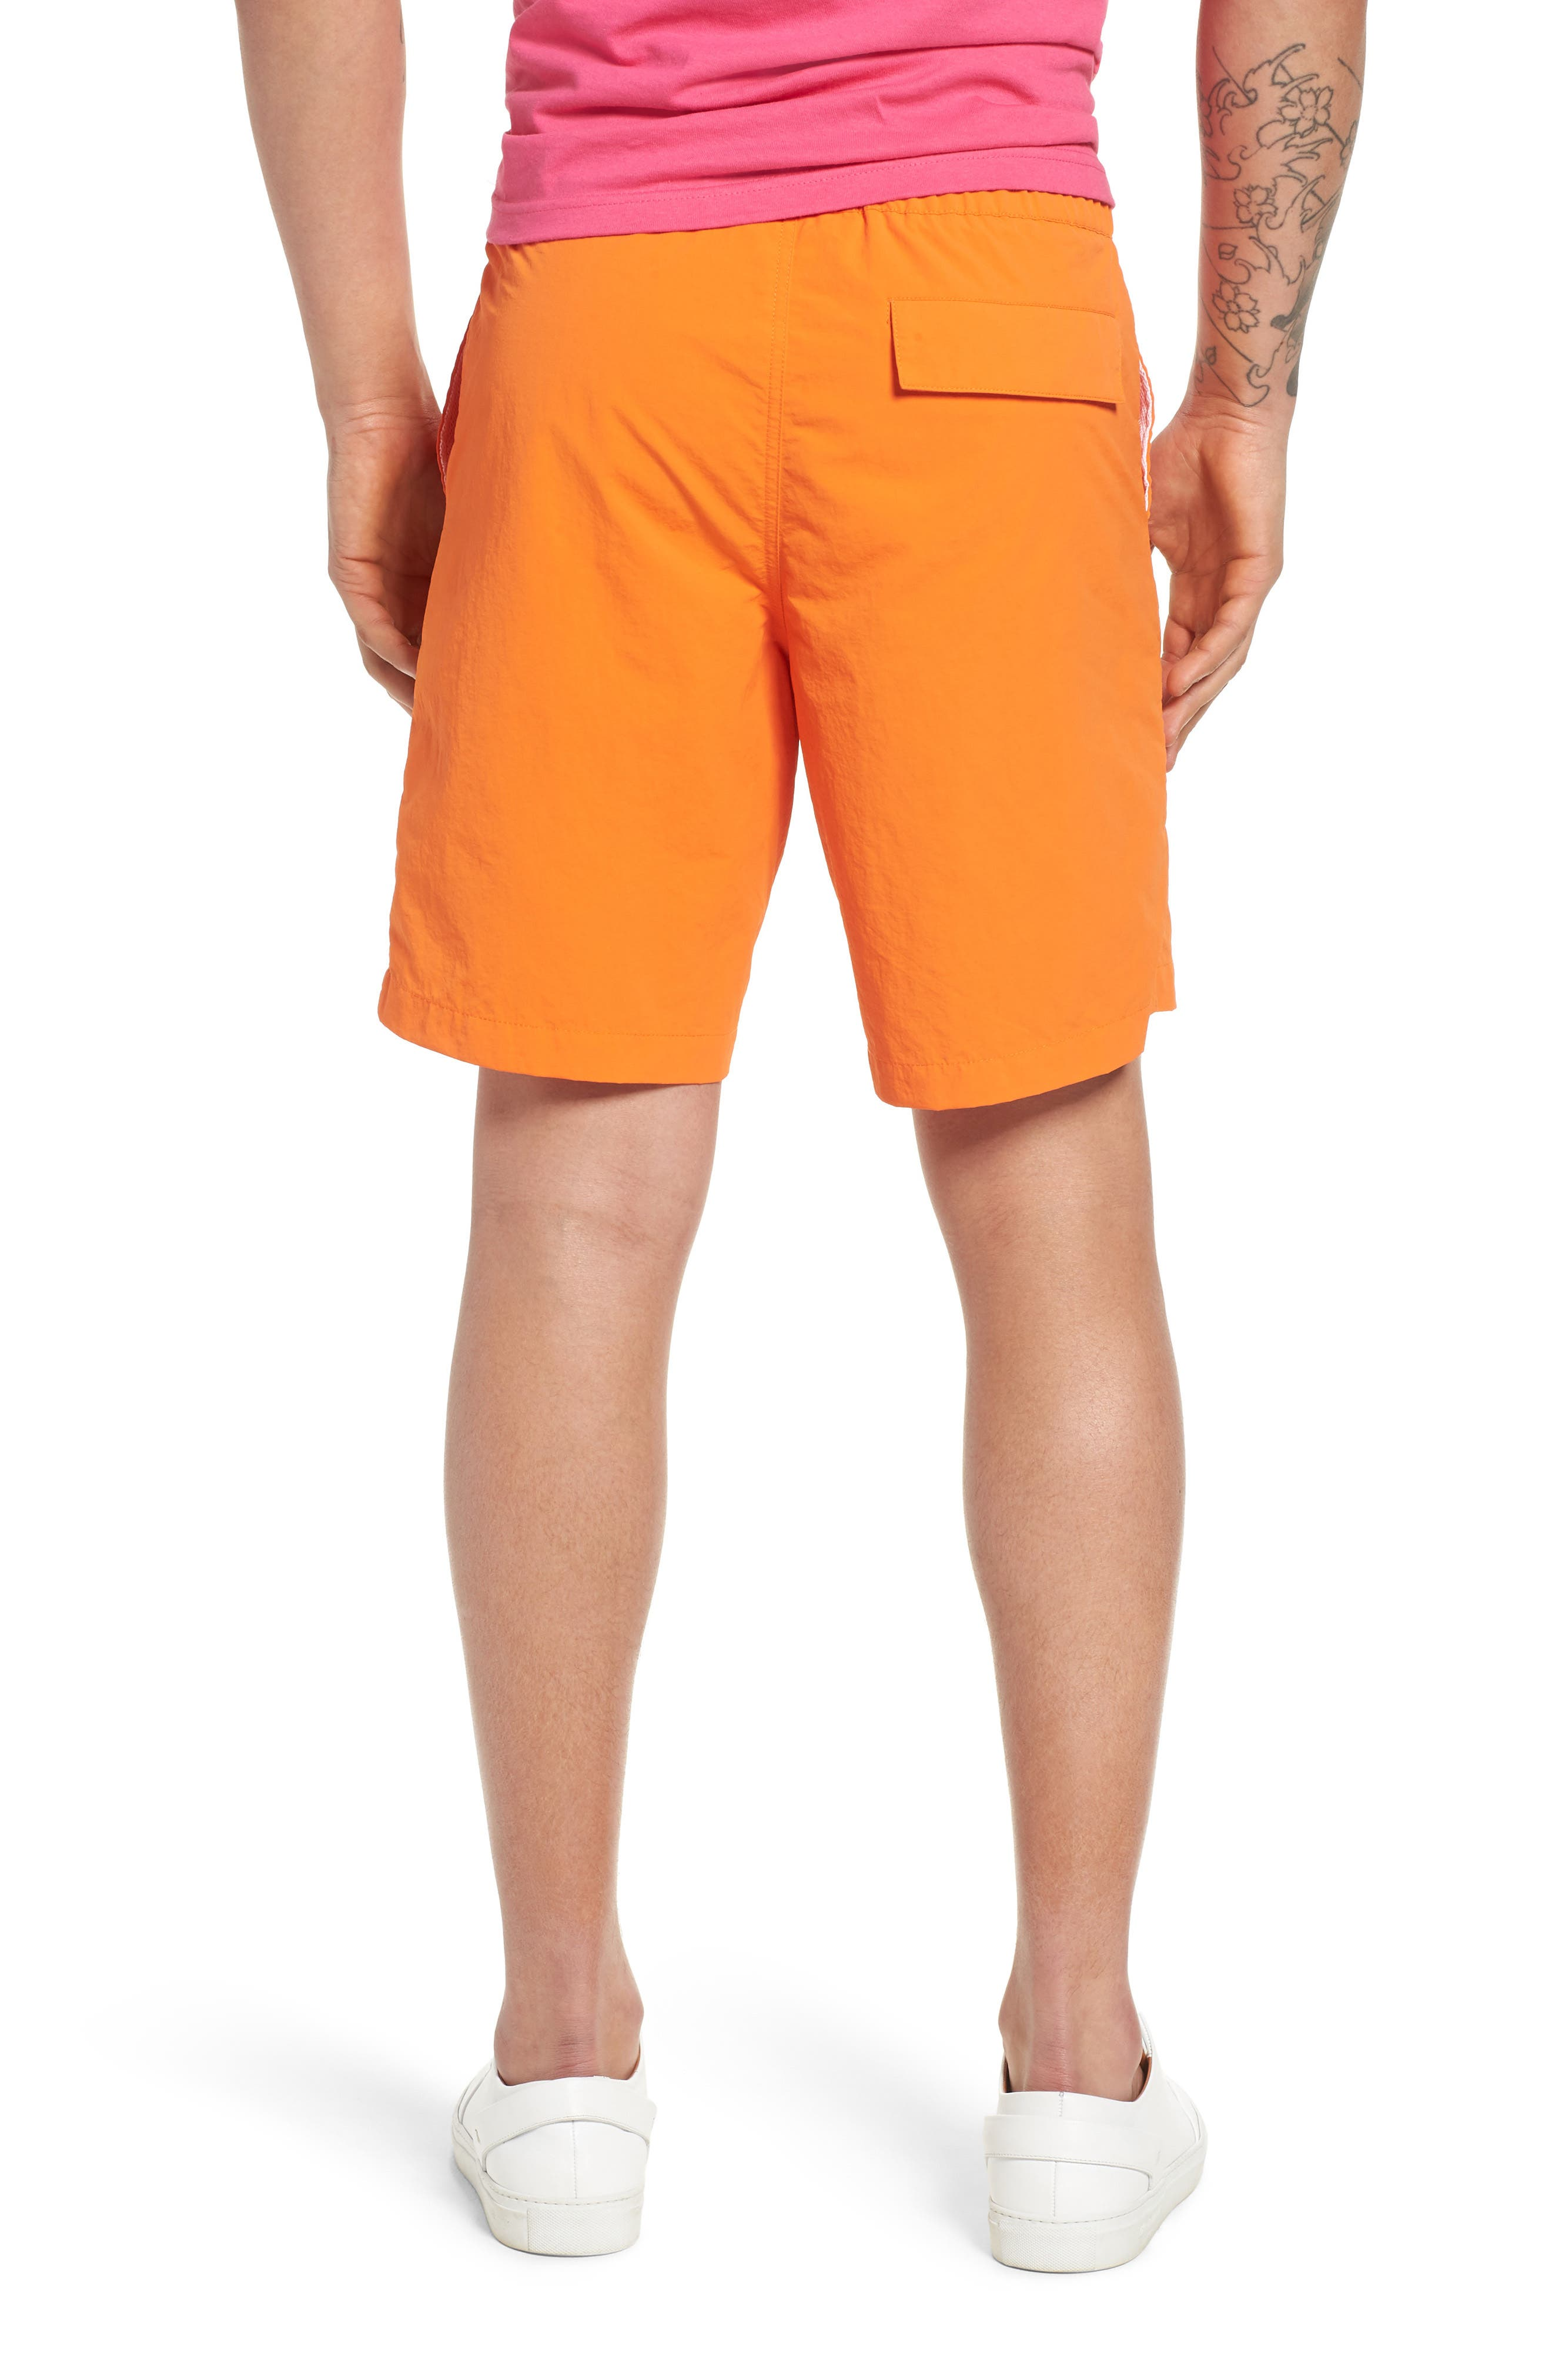 Mondy Shorts,                             Alternate thumbnail 10, color,